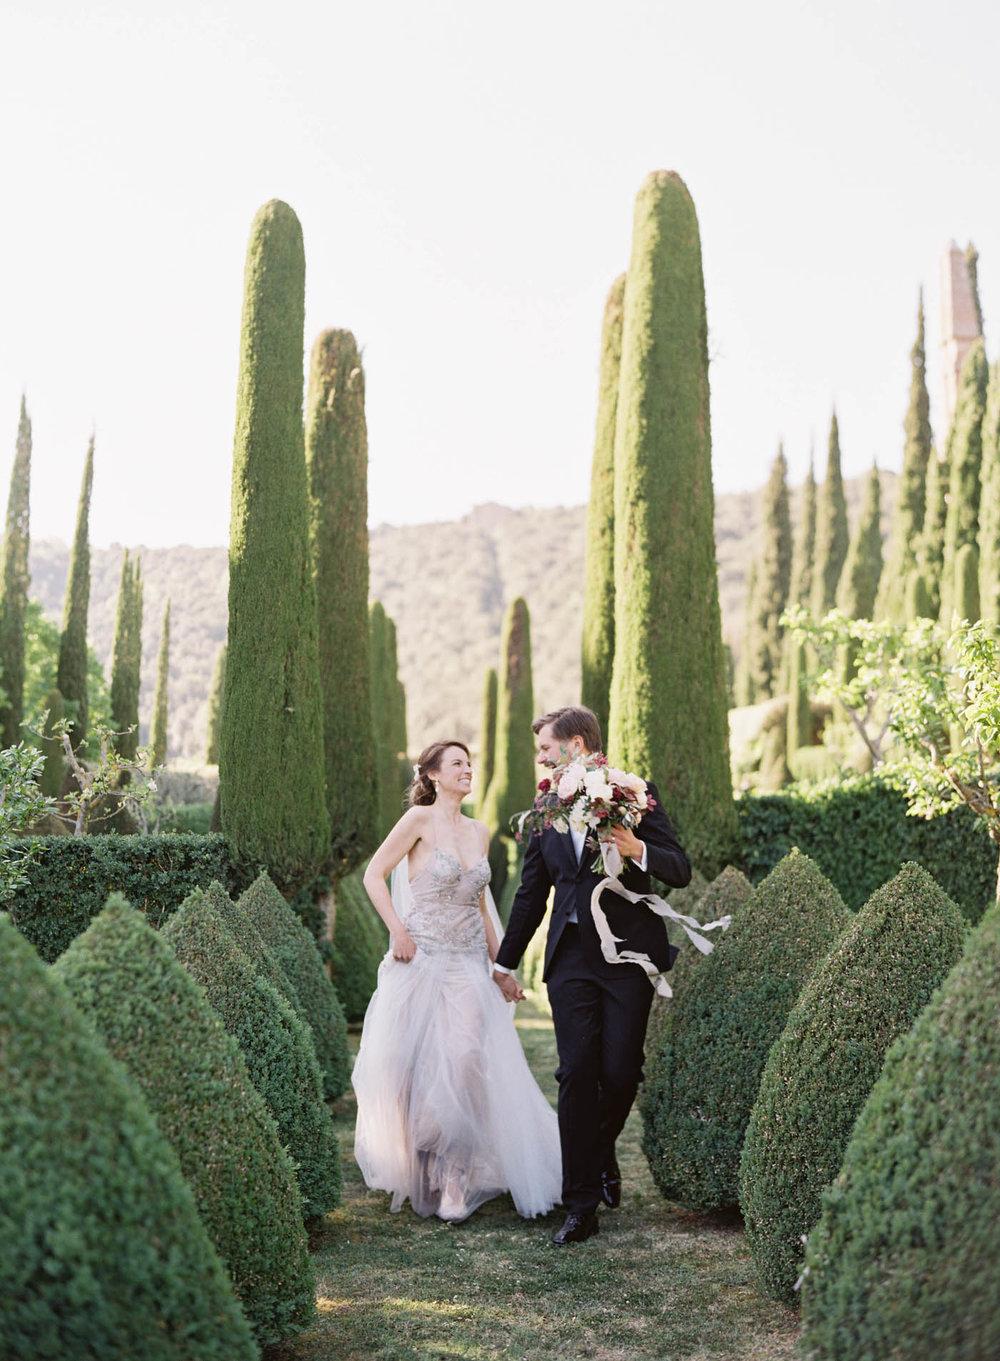 Villa_Cetinale_Wedding-42-Jen_Huang-ElanJacob-260-Jen_Huang-007316-R1-015.jpg